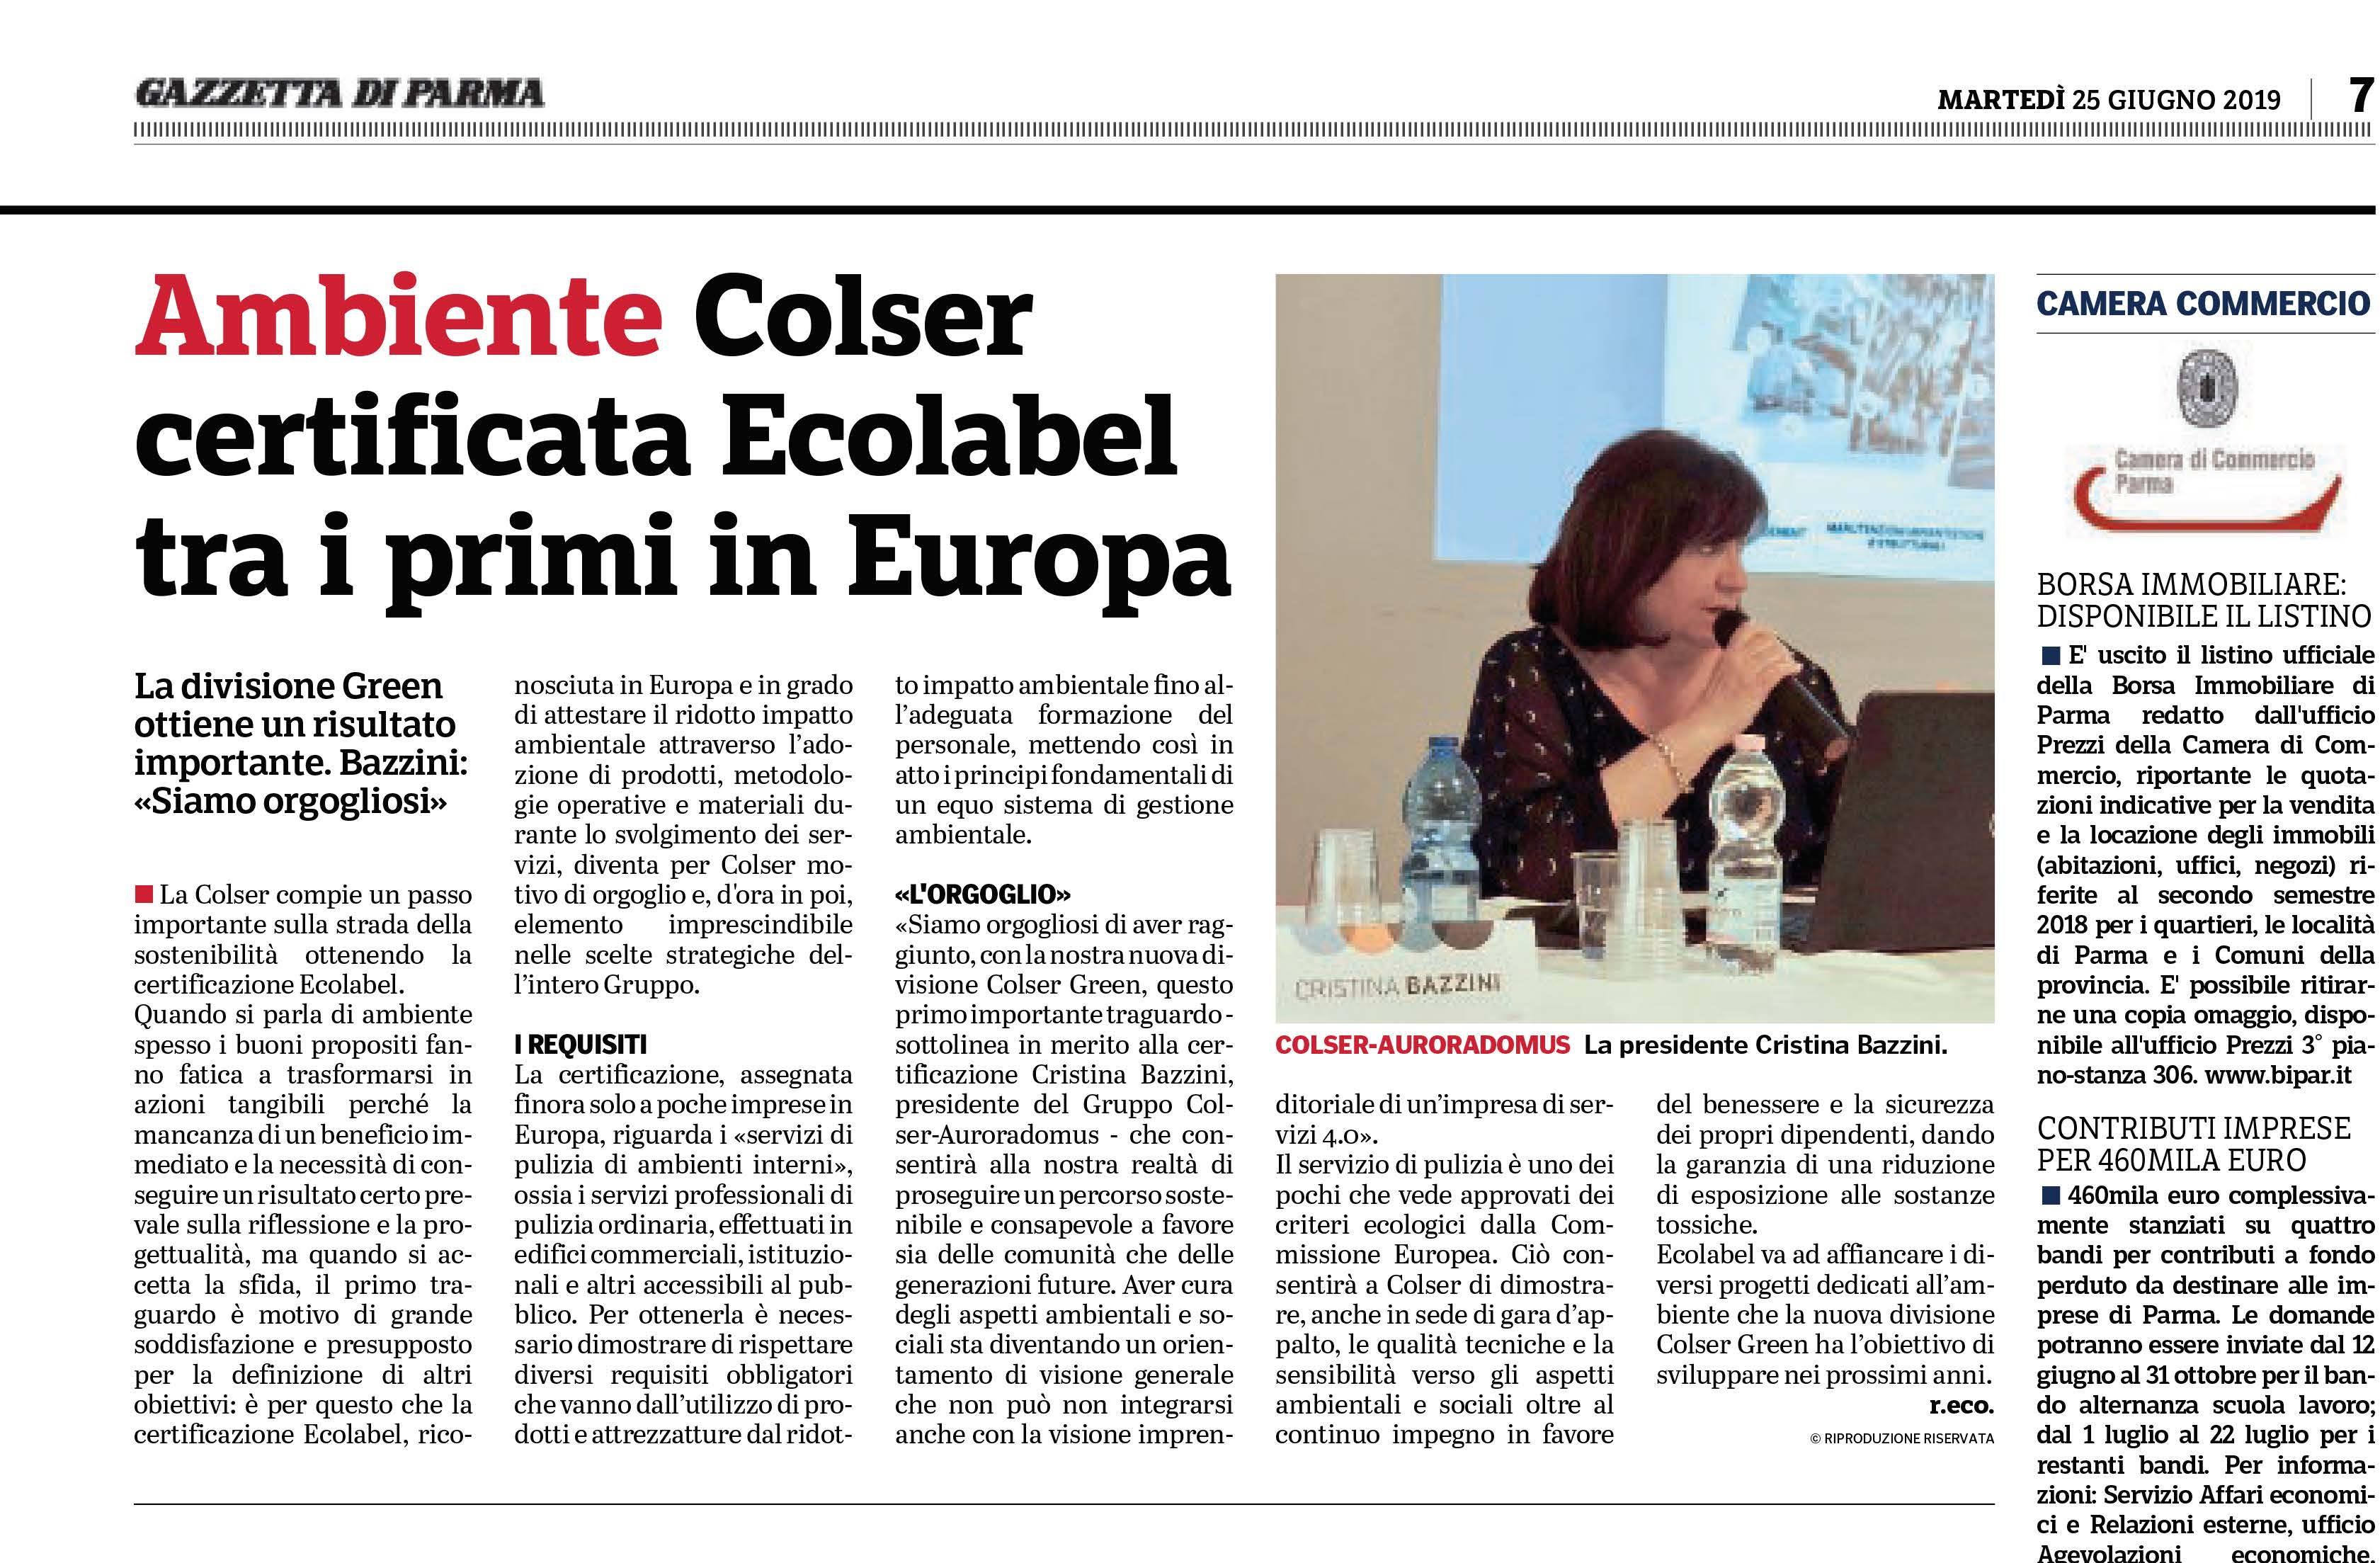 COLSER Green - certificata EU ECOLABEL tra i primi in Europa